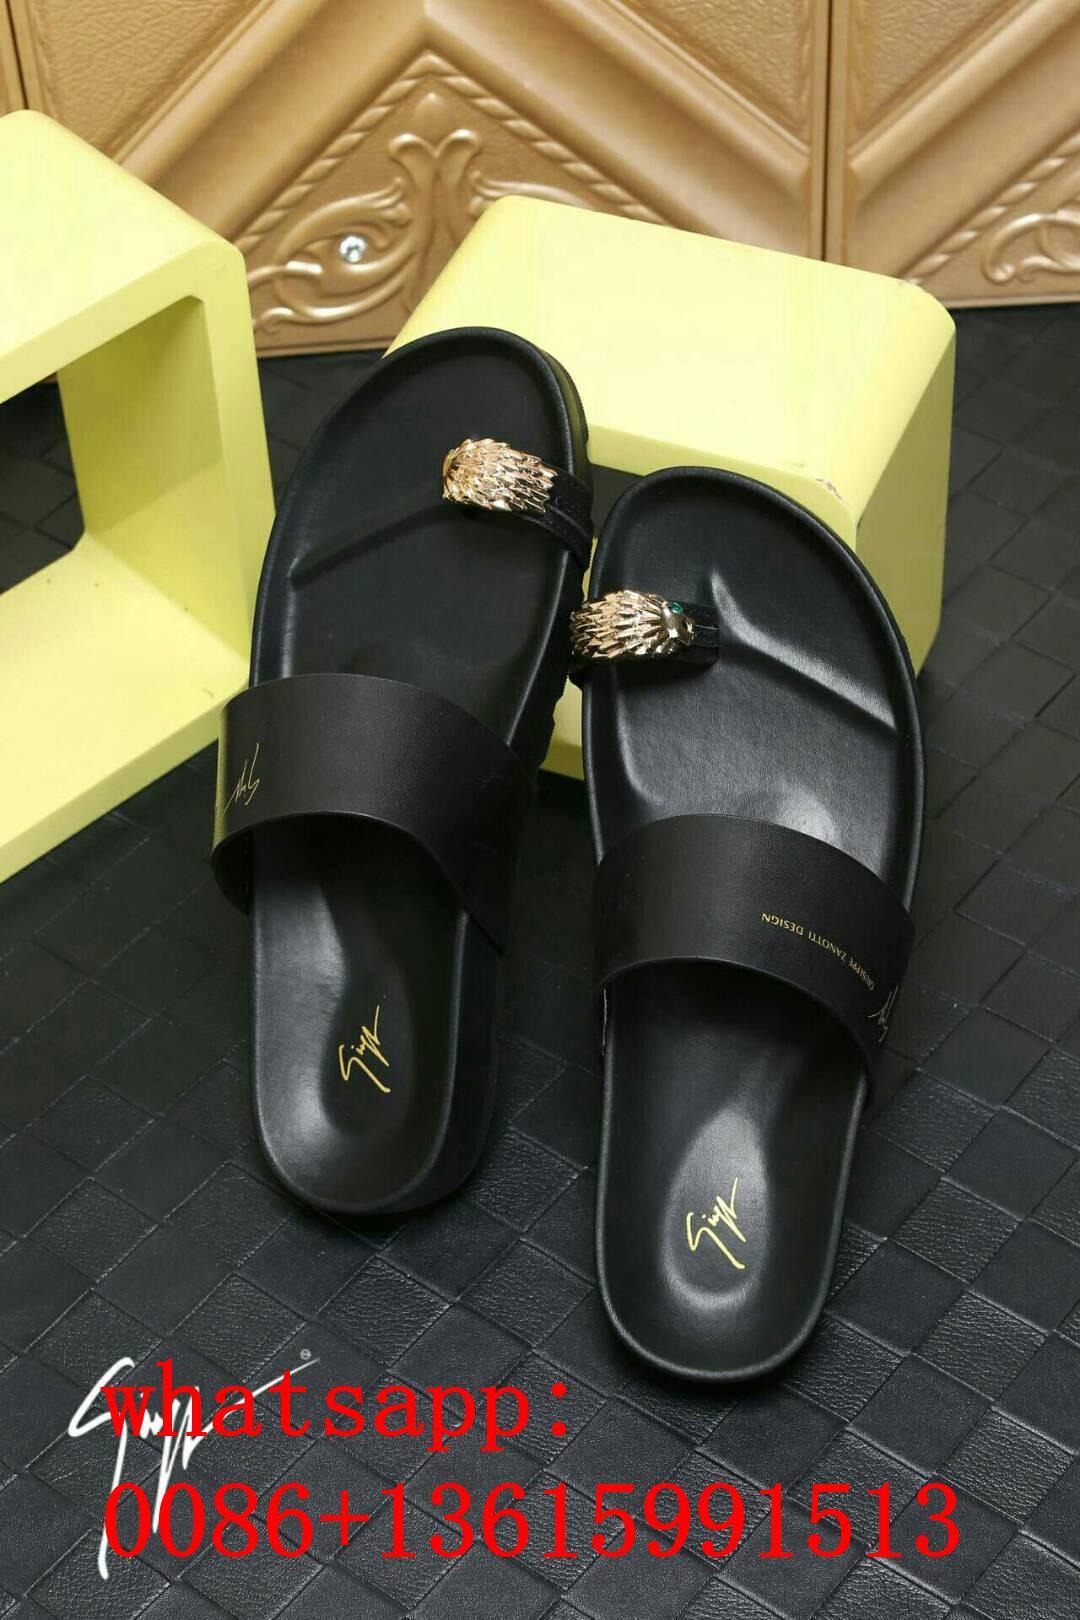 GZ sandal